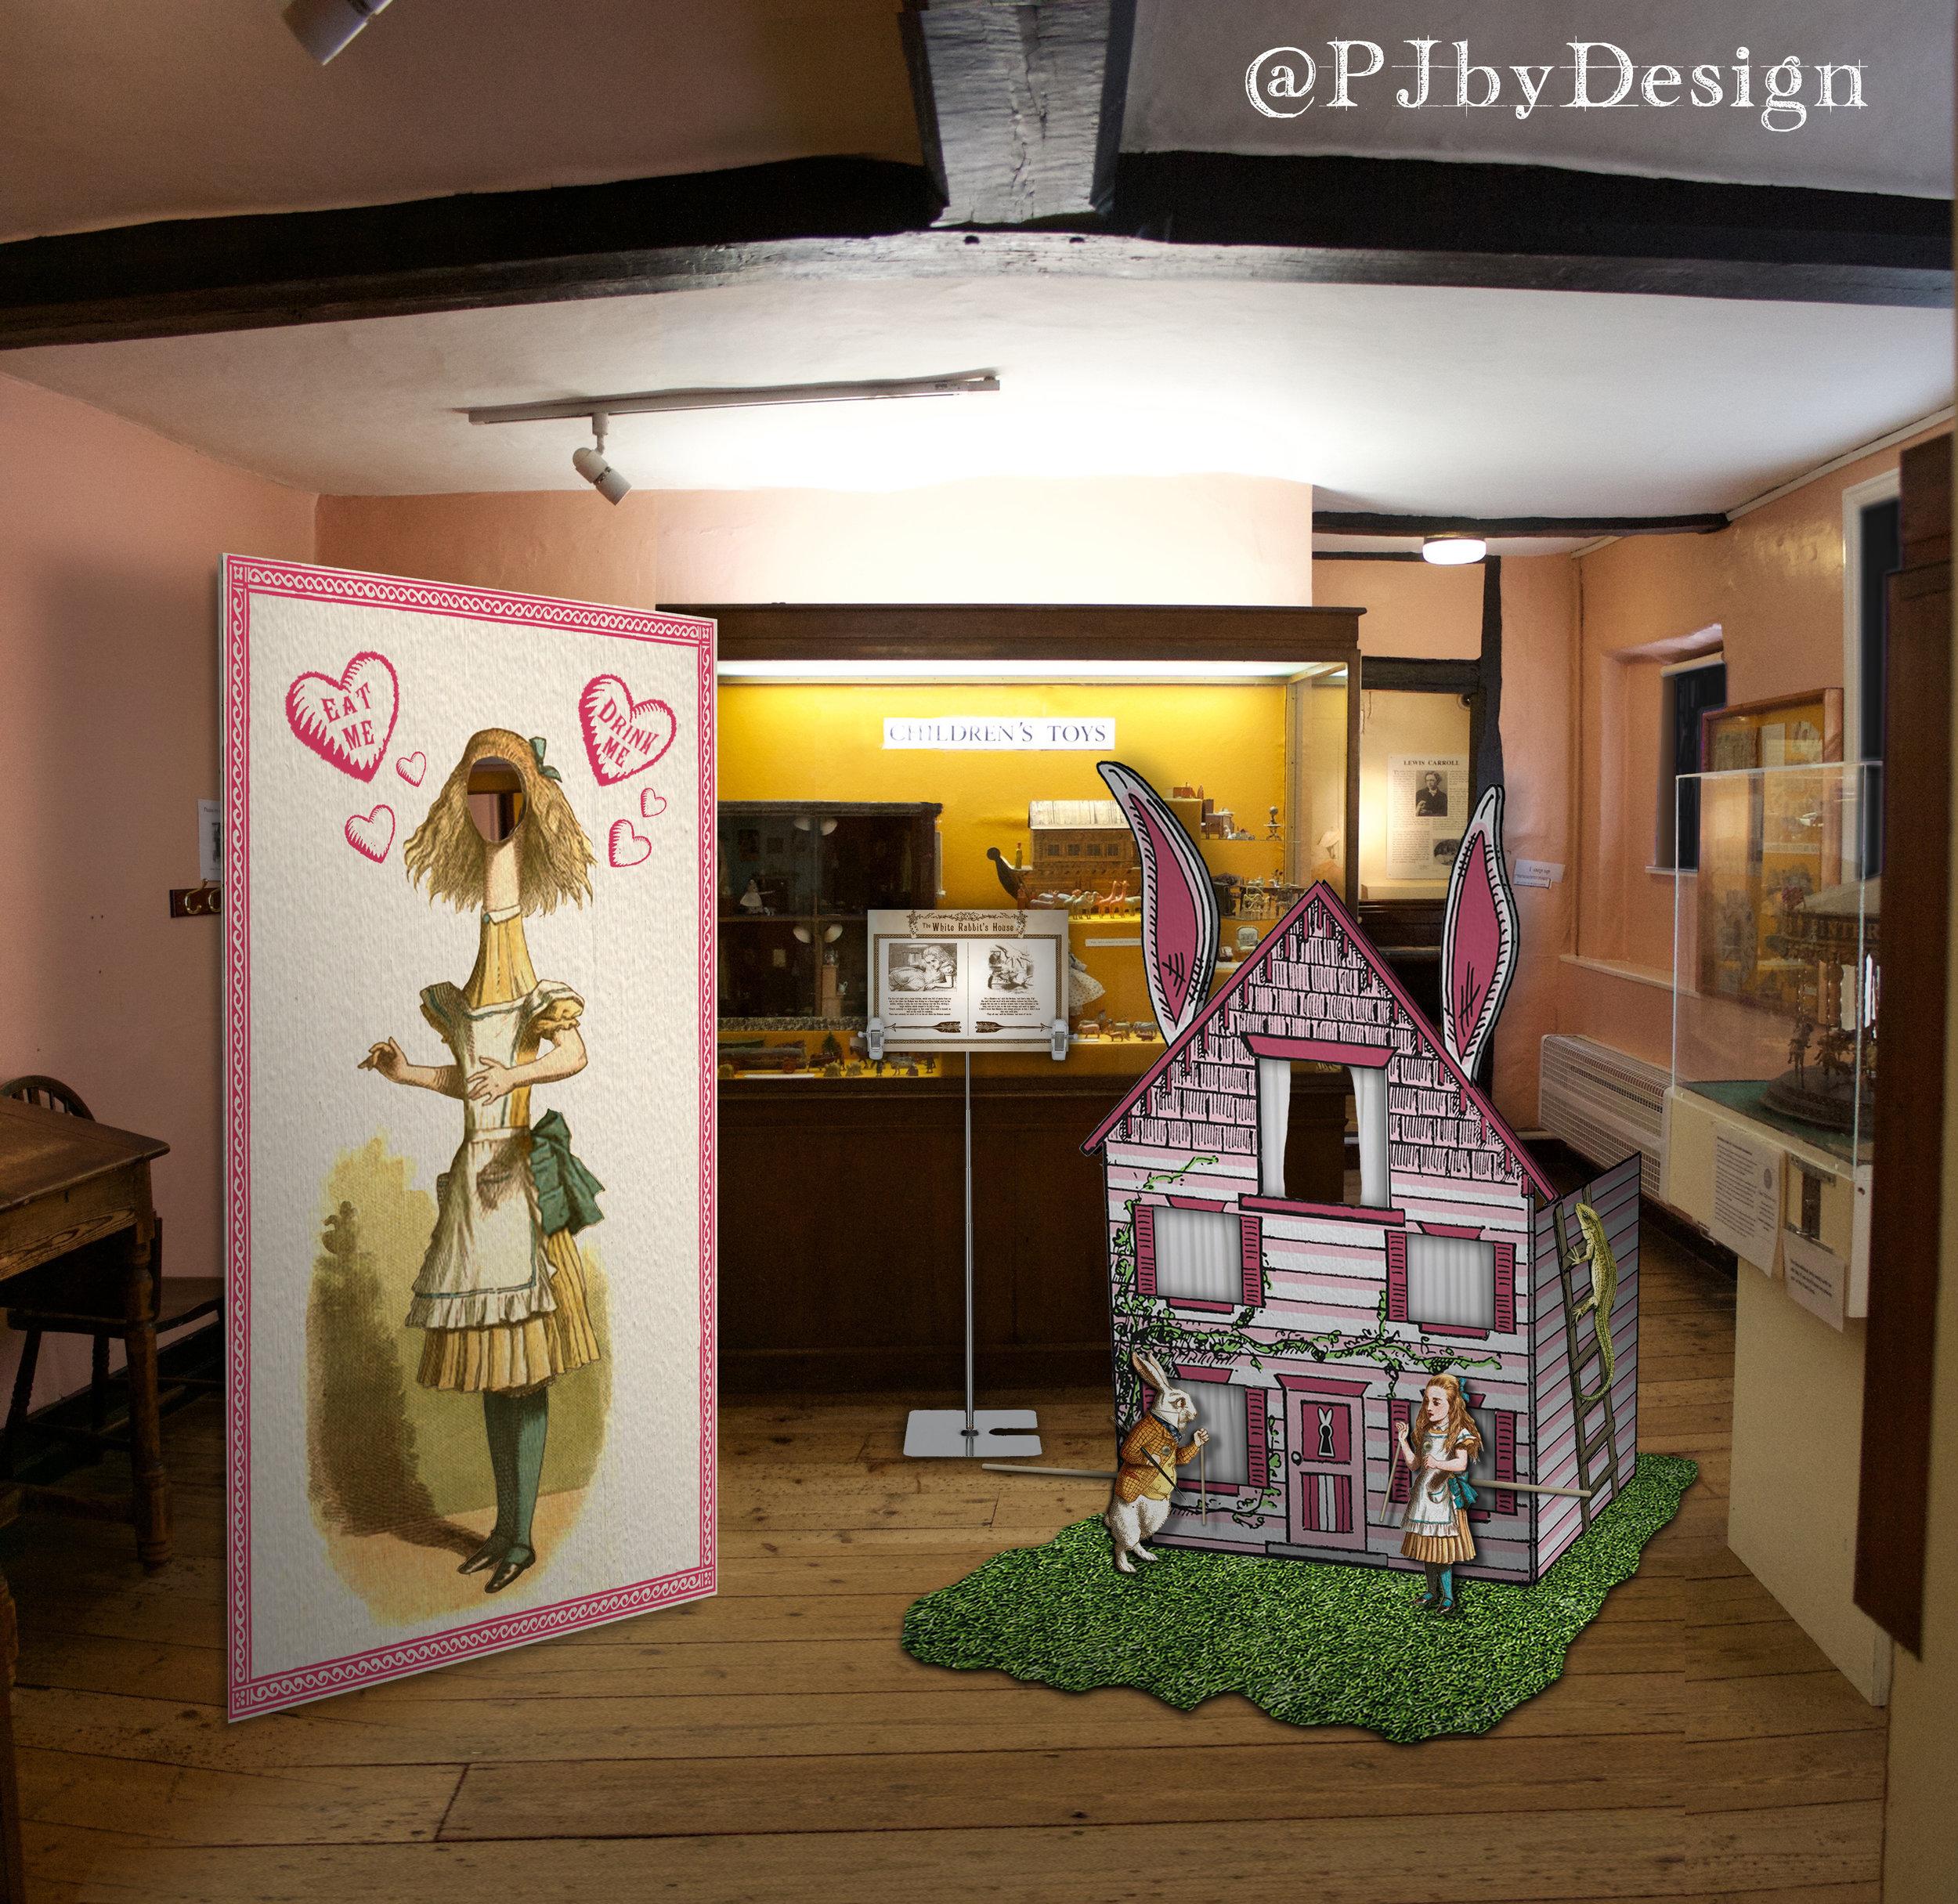 12 White Rabbits House Set.jpg